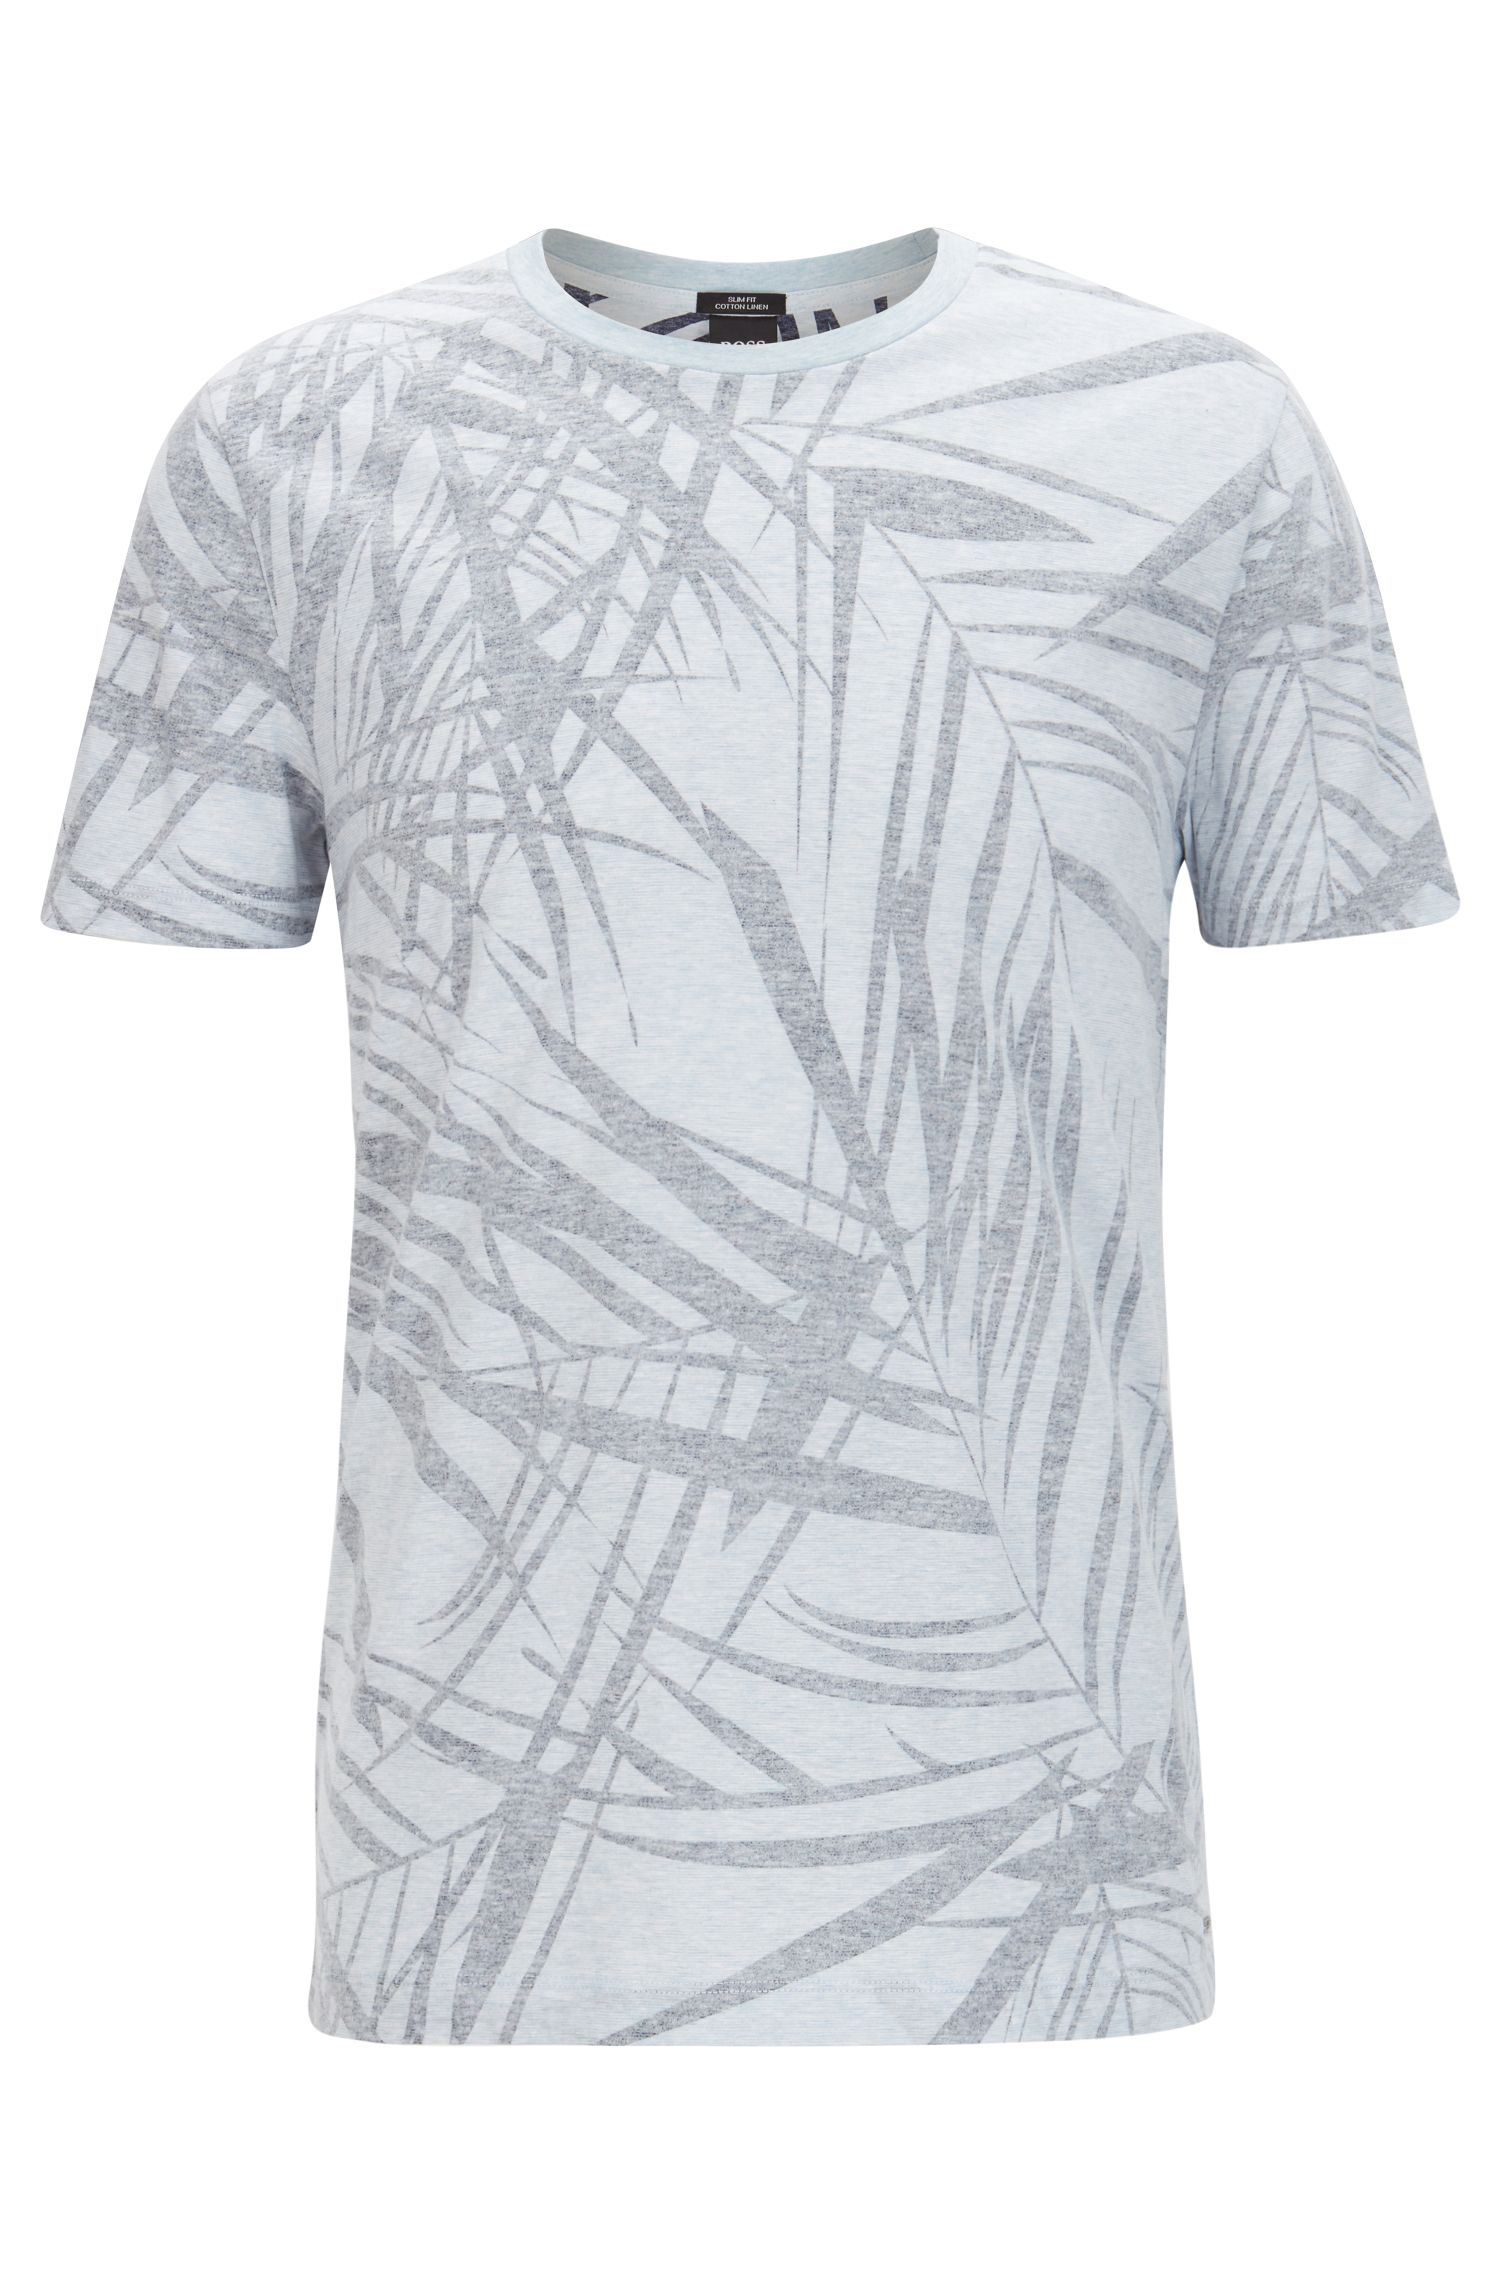 Leaf-Print Cotton Linen T-Shirt | Tessler